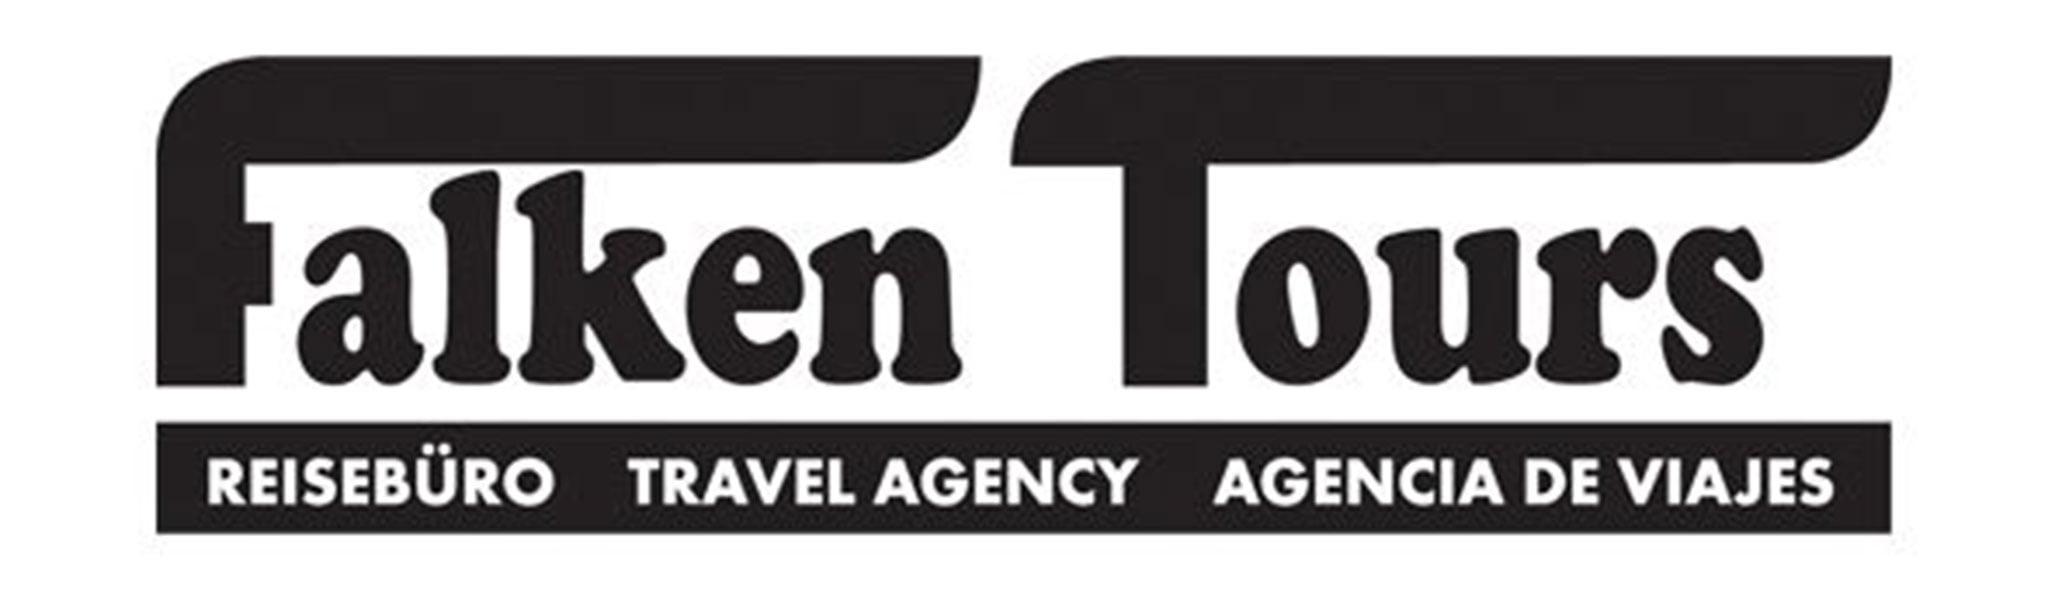 Logotipo Falken Tours